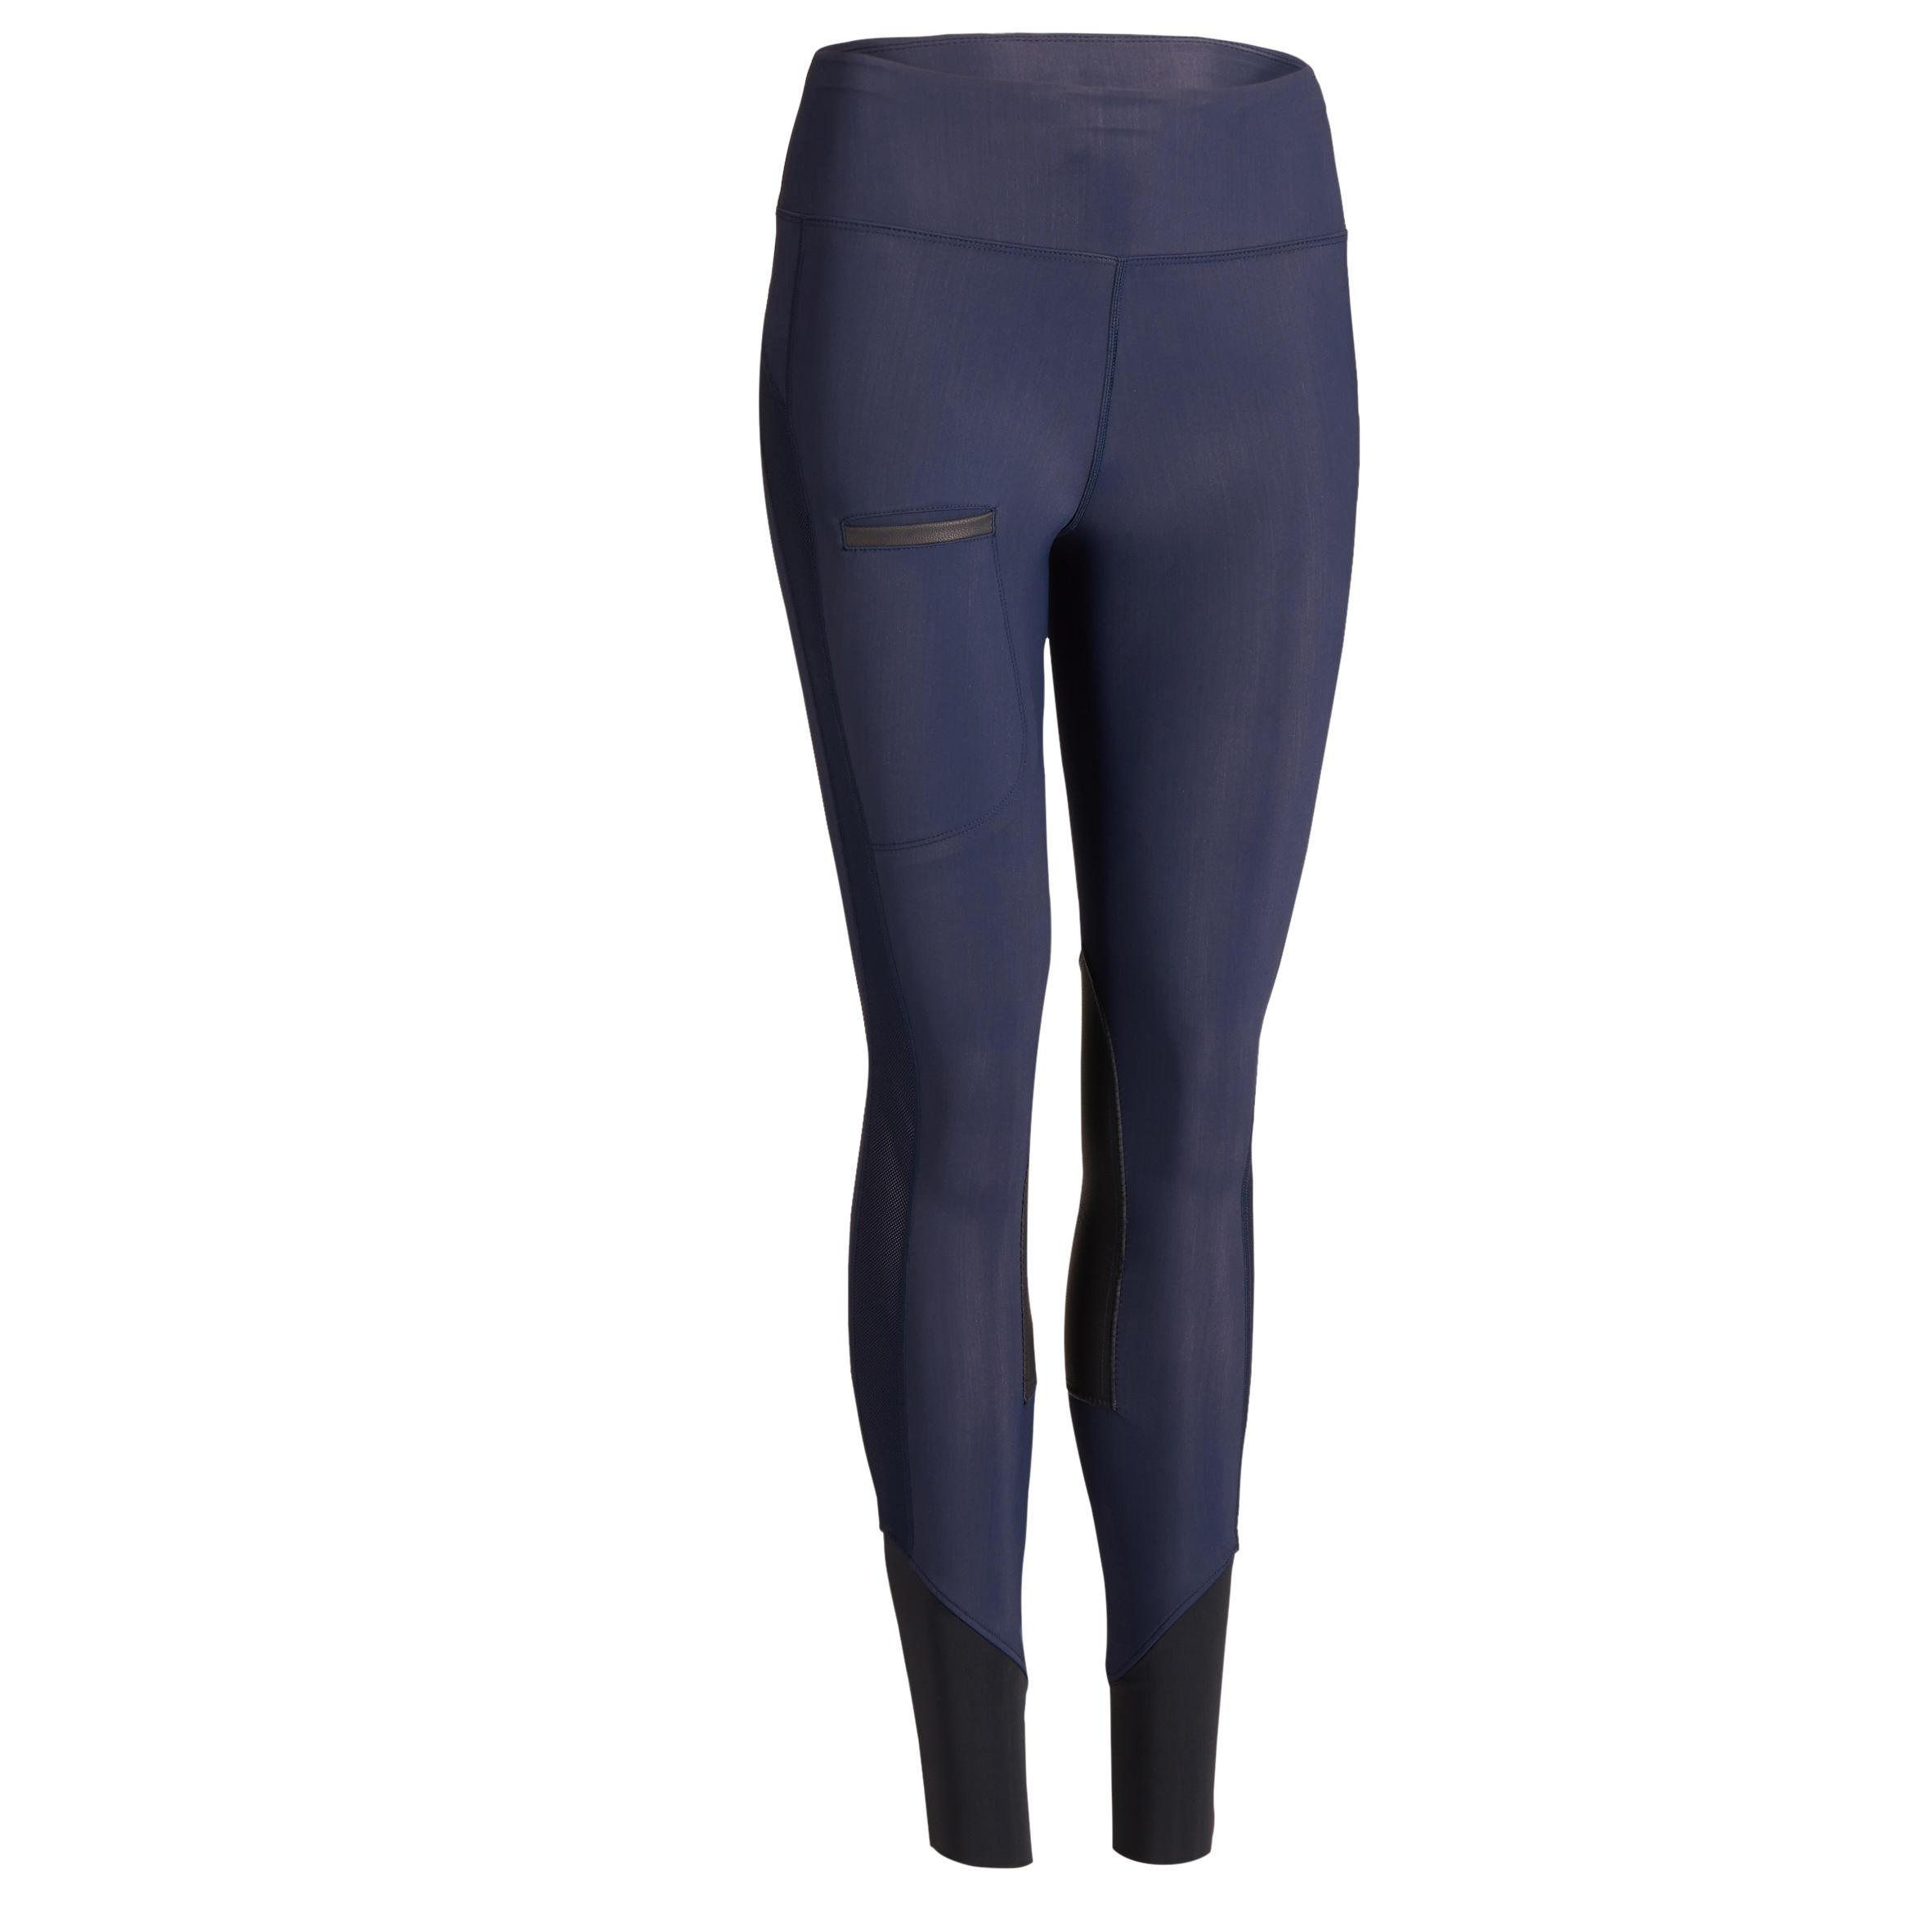 Pantalon équitation femme 100 light marine fouganza